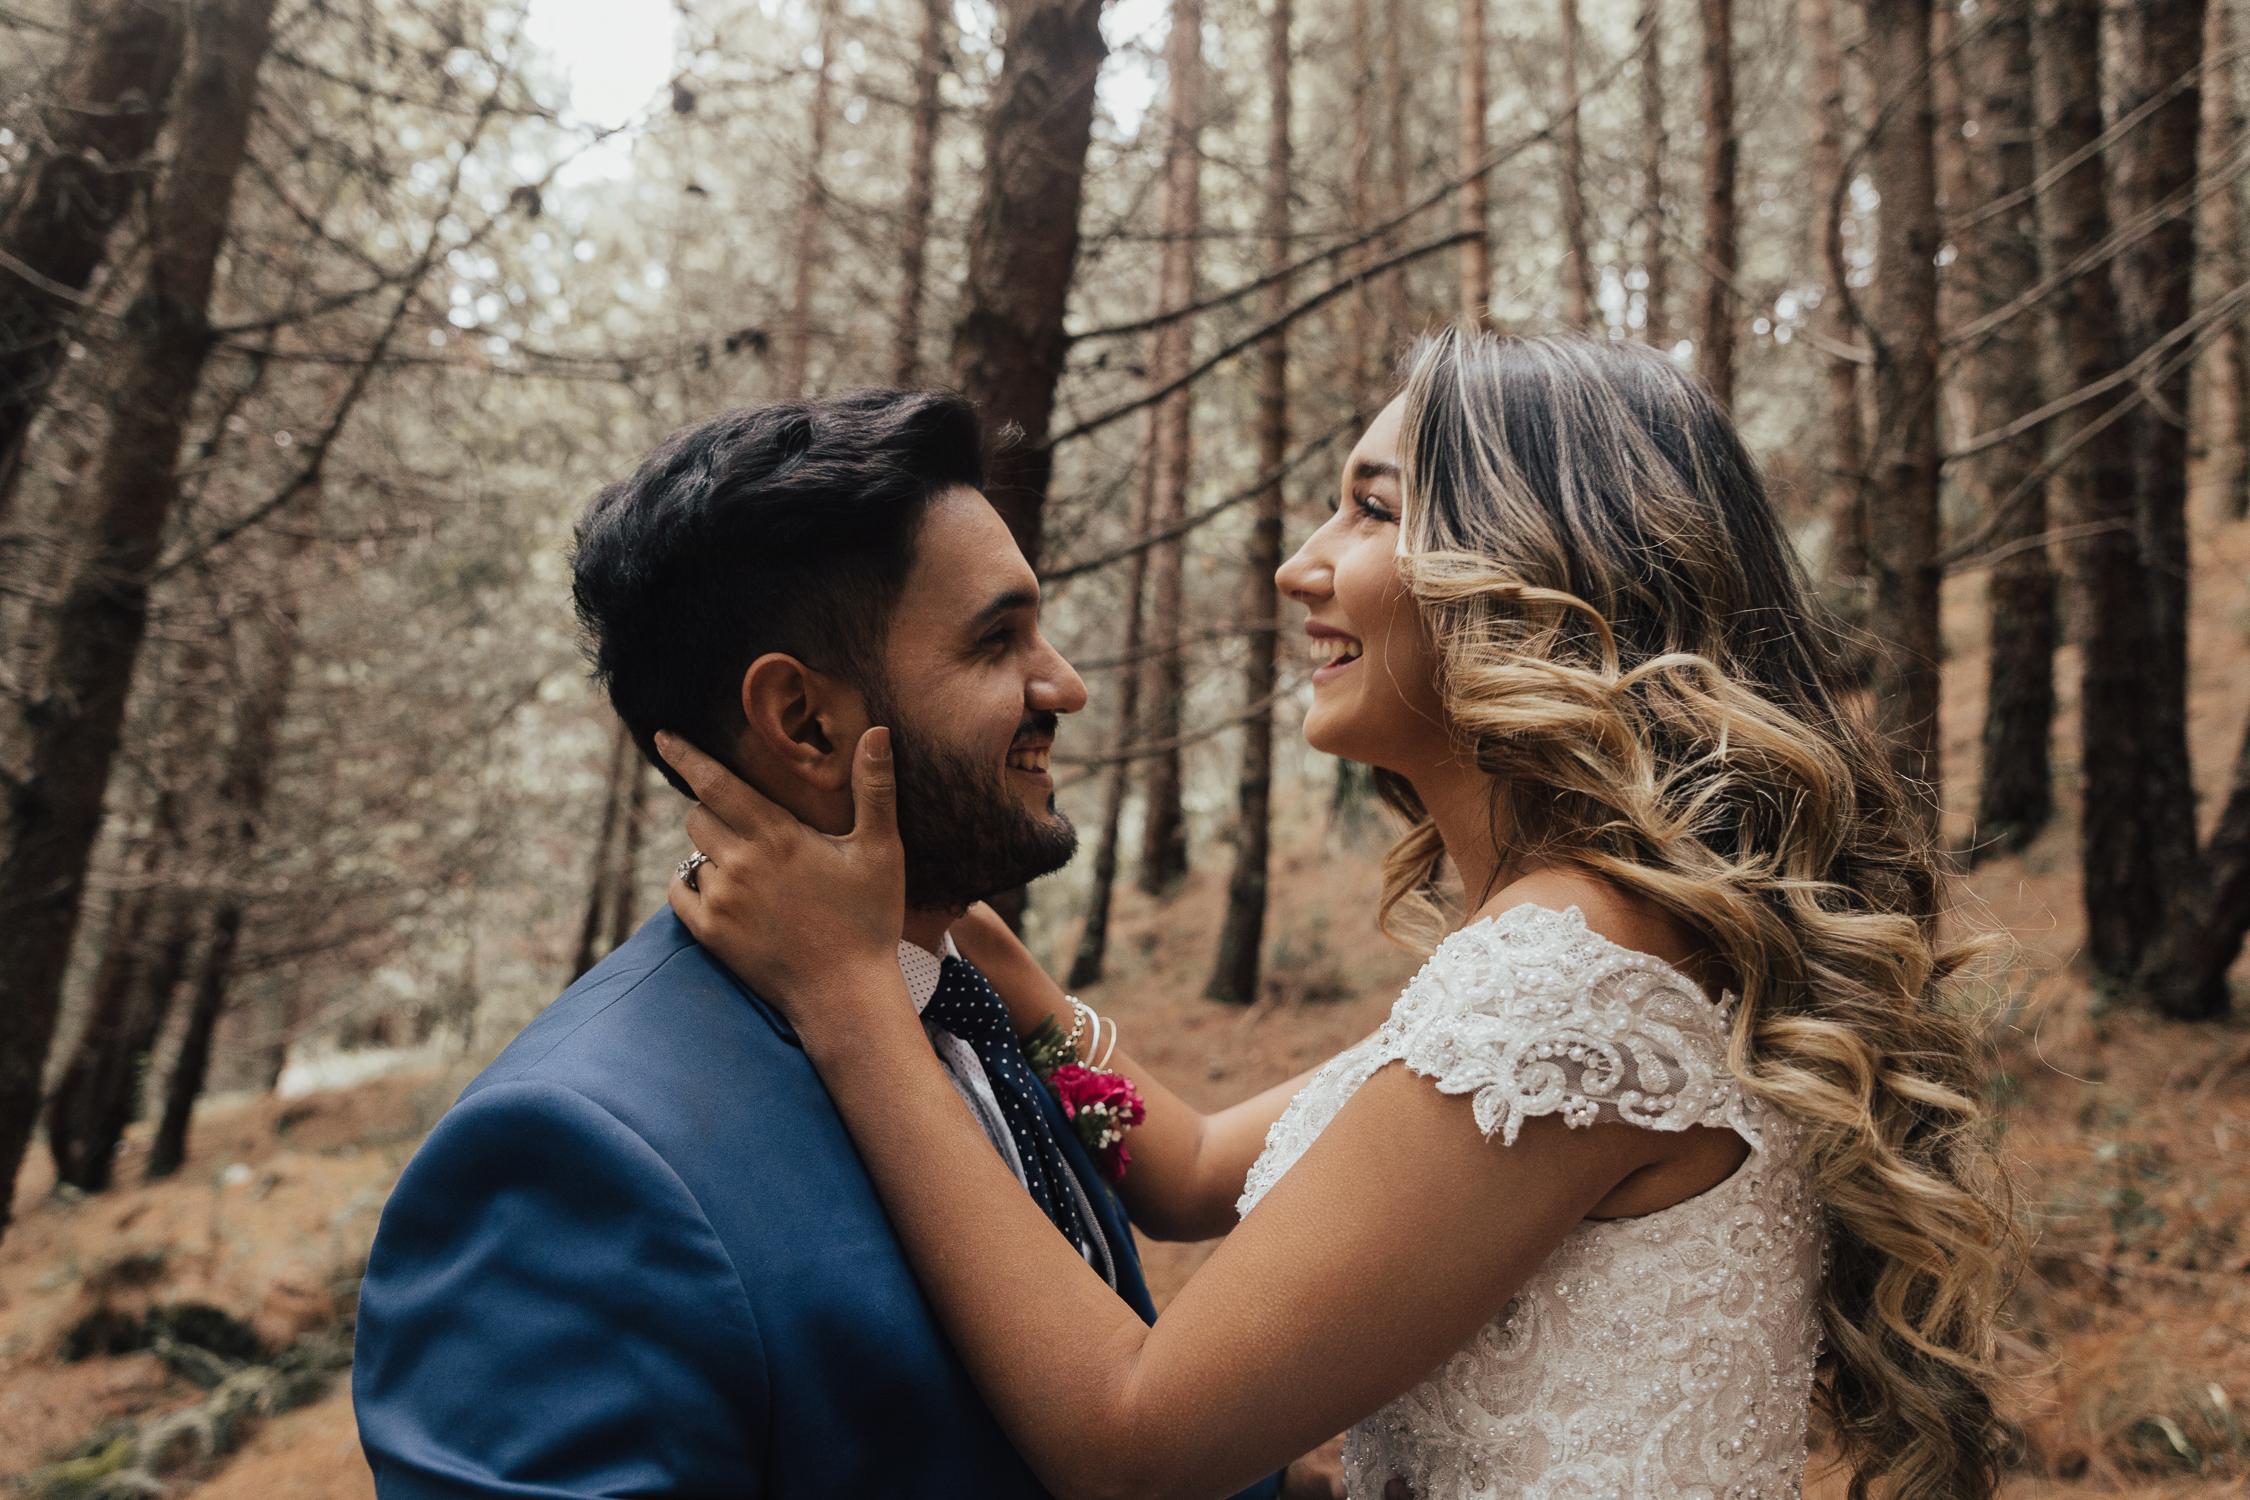 Michelle-Agurto-Fotografia-Bodas-Destination-Wedding-Photographer-Ecuador-Sesion-Johanna-Eduardo-38.JPG